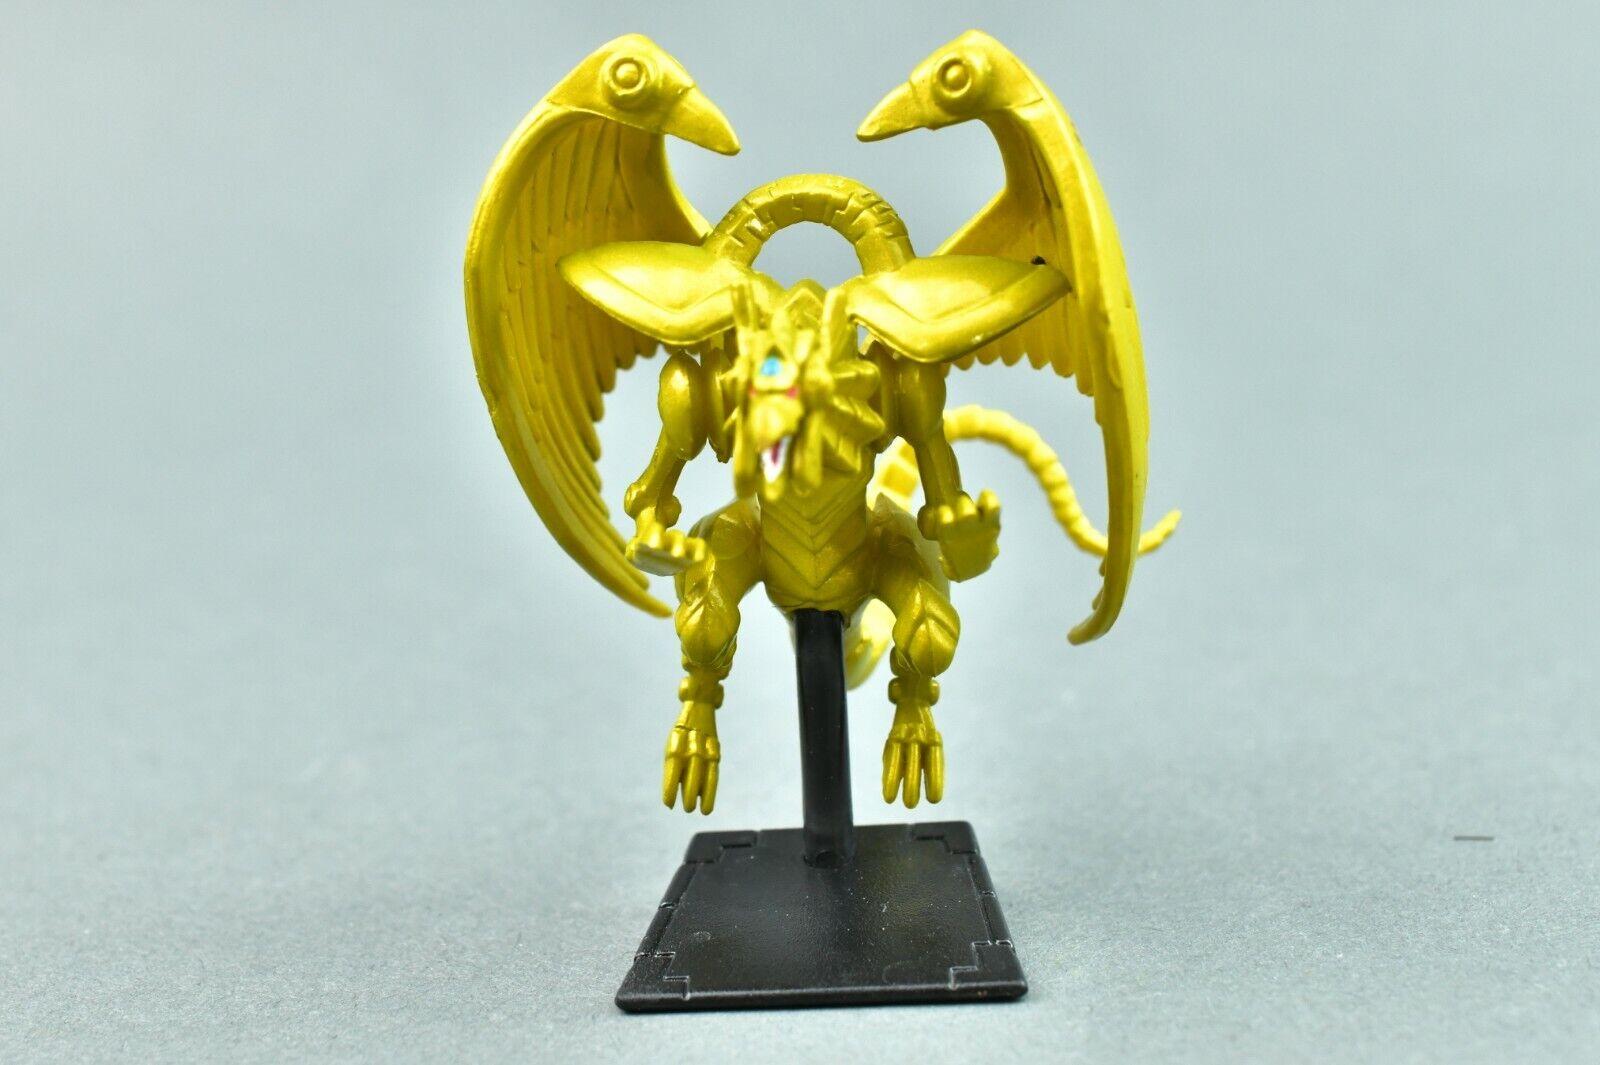 Yu Gi Oh - The Winged Dragon Of Ra -  Mattel 1996 Vintage Mini Figurines  garanti